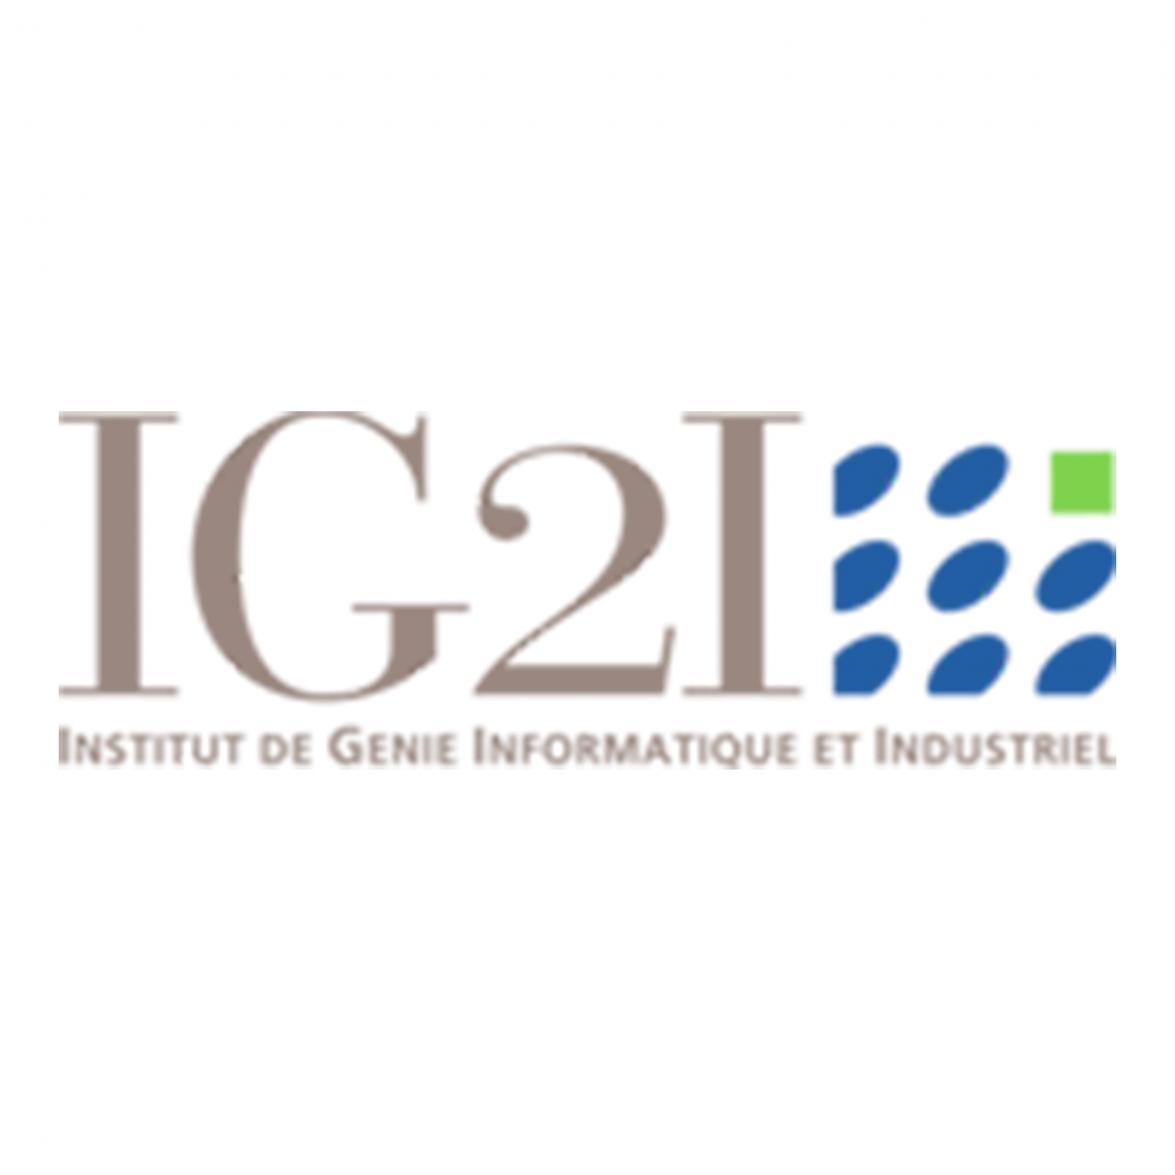 Angèle Von kiss - Mes clients - IG2I